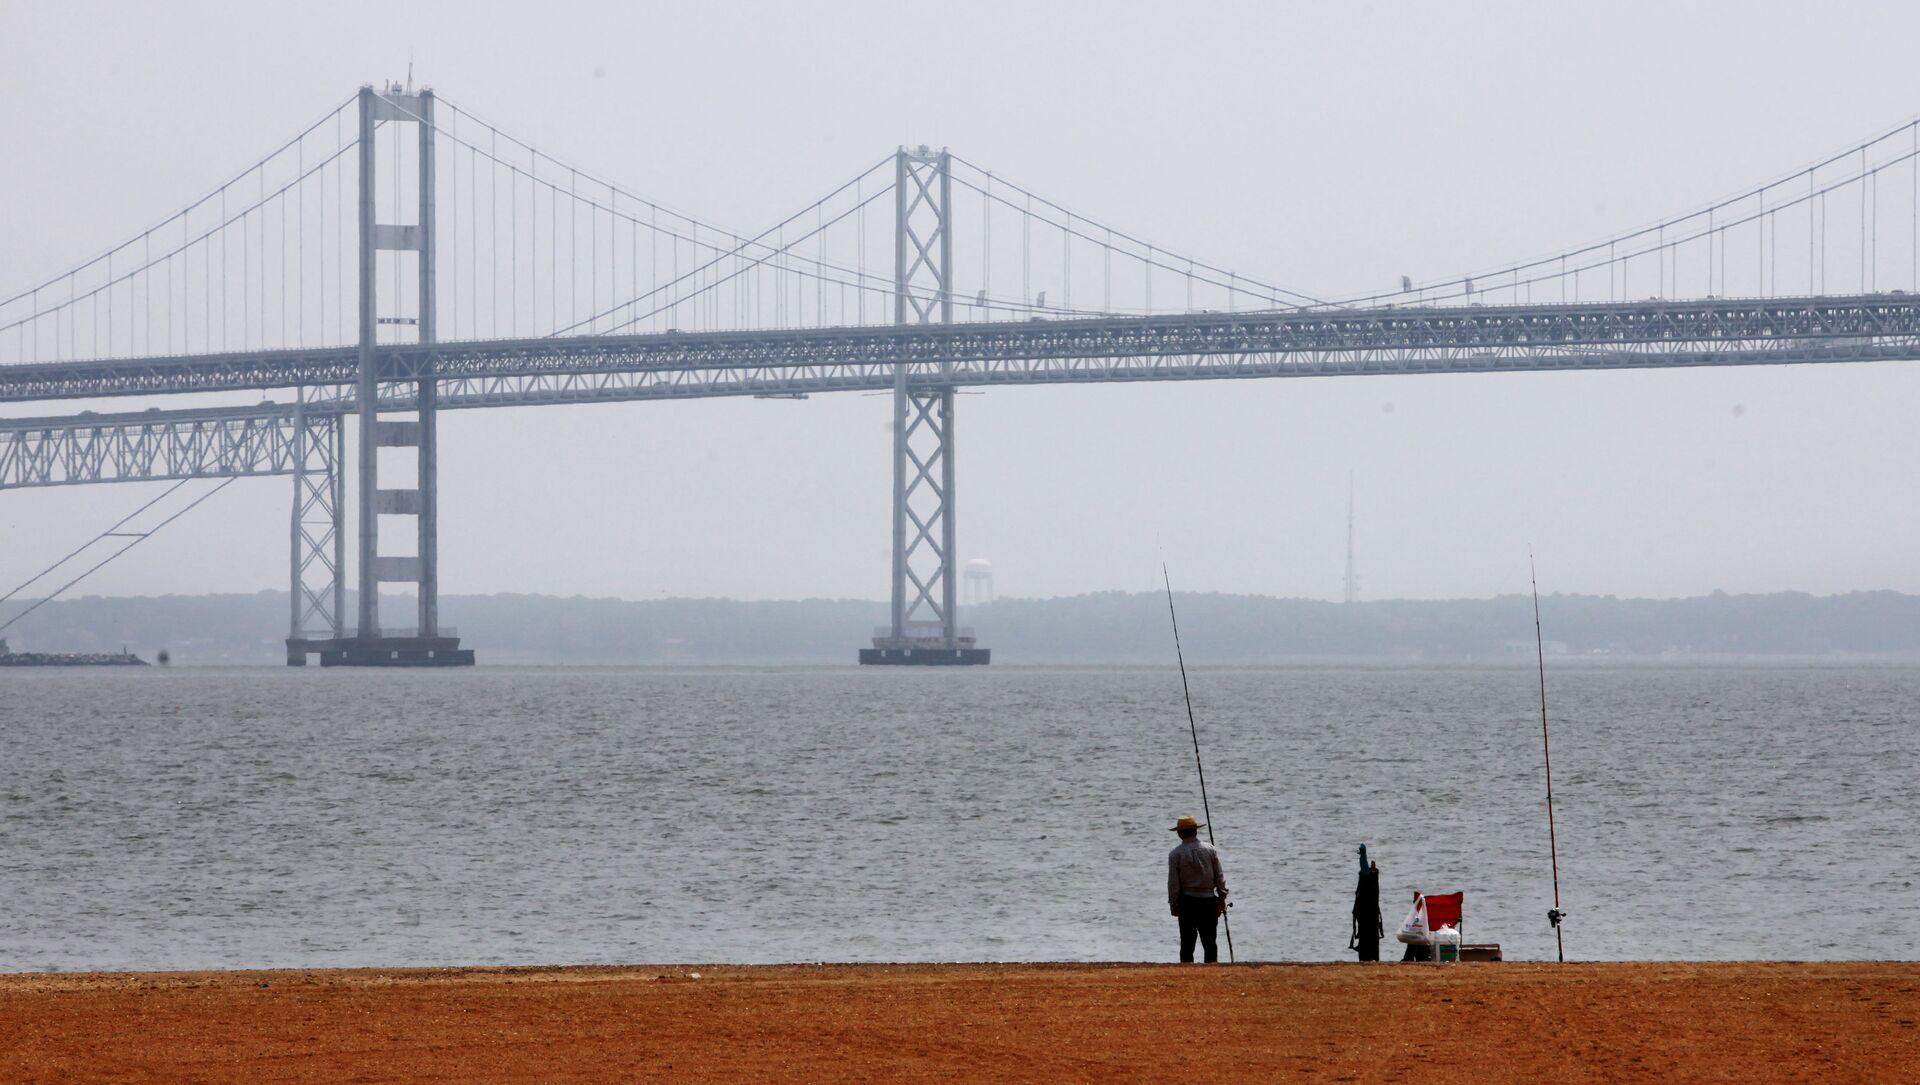 Baie de Chesapeake, 2010 - Sputnik France, 1920, 16.09.2021